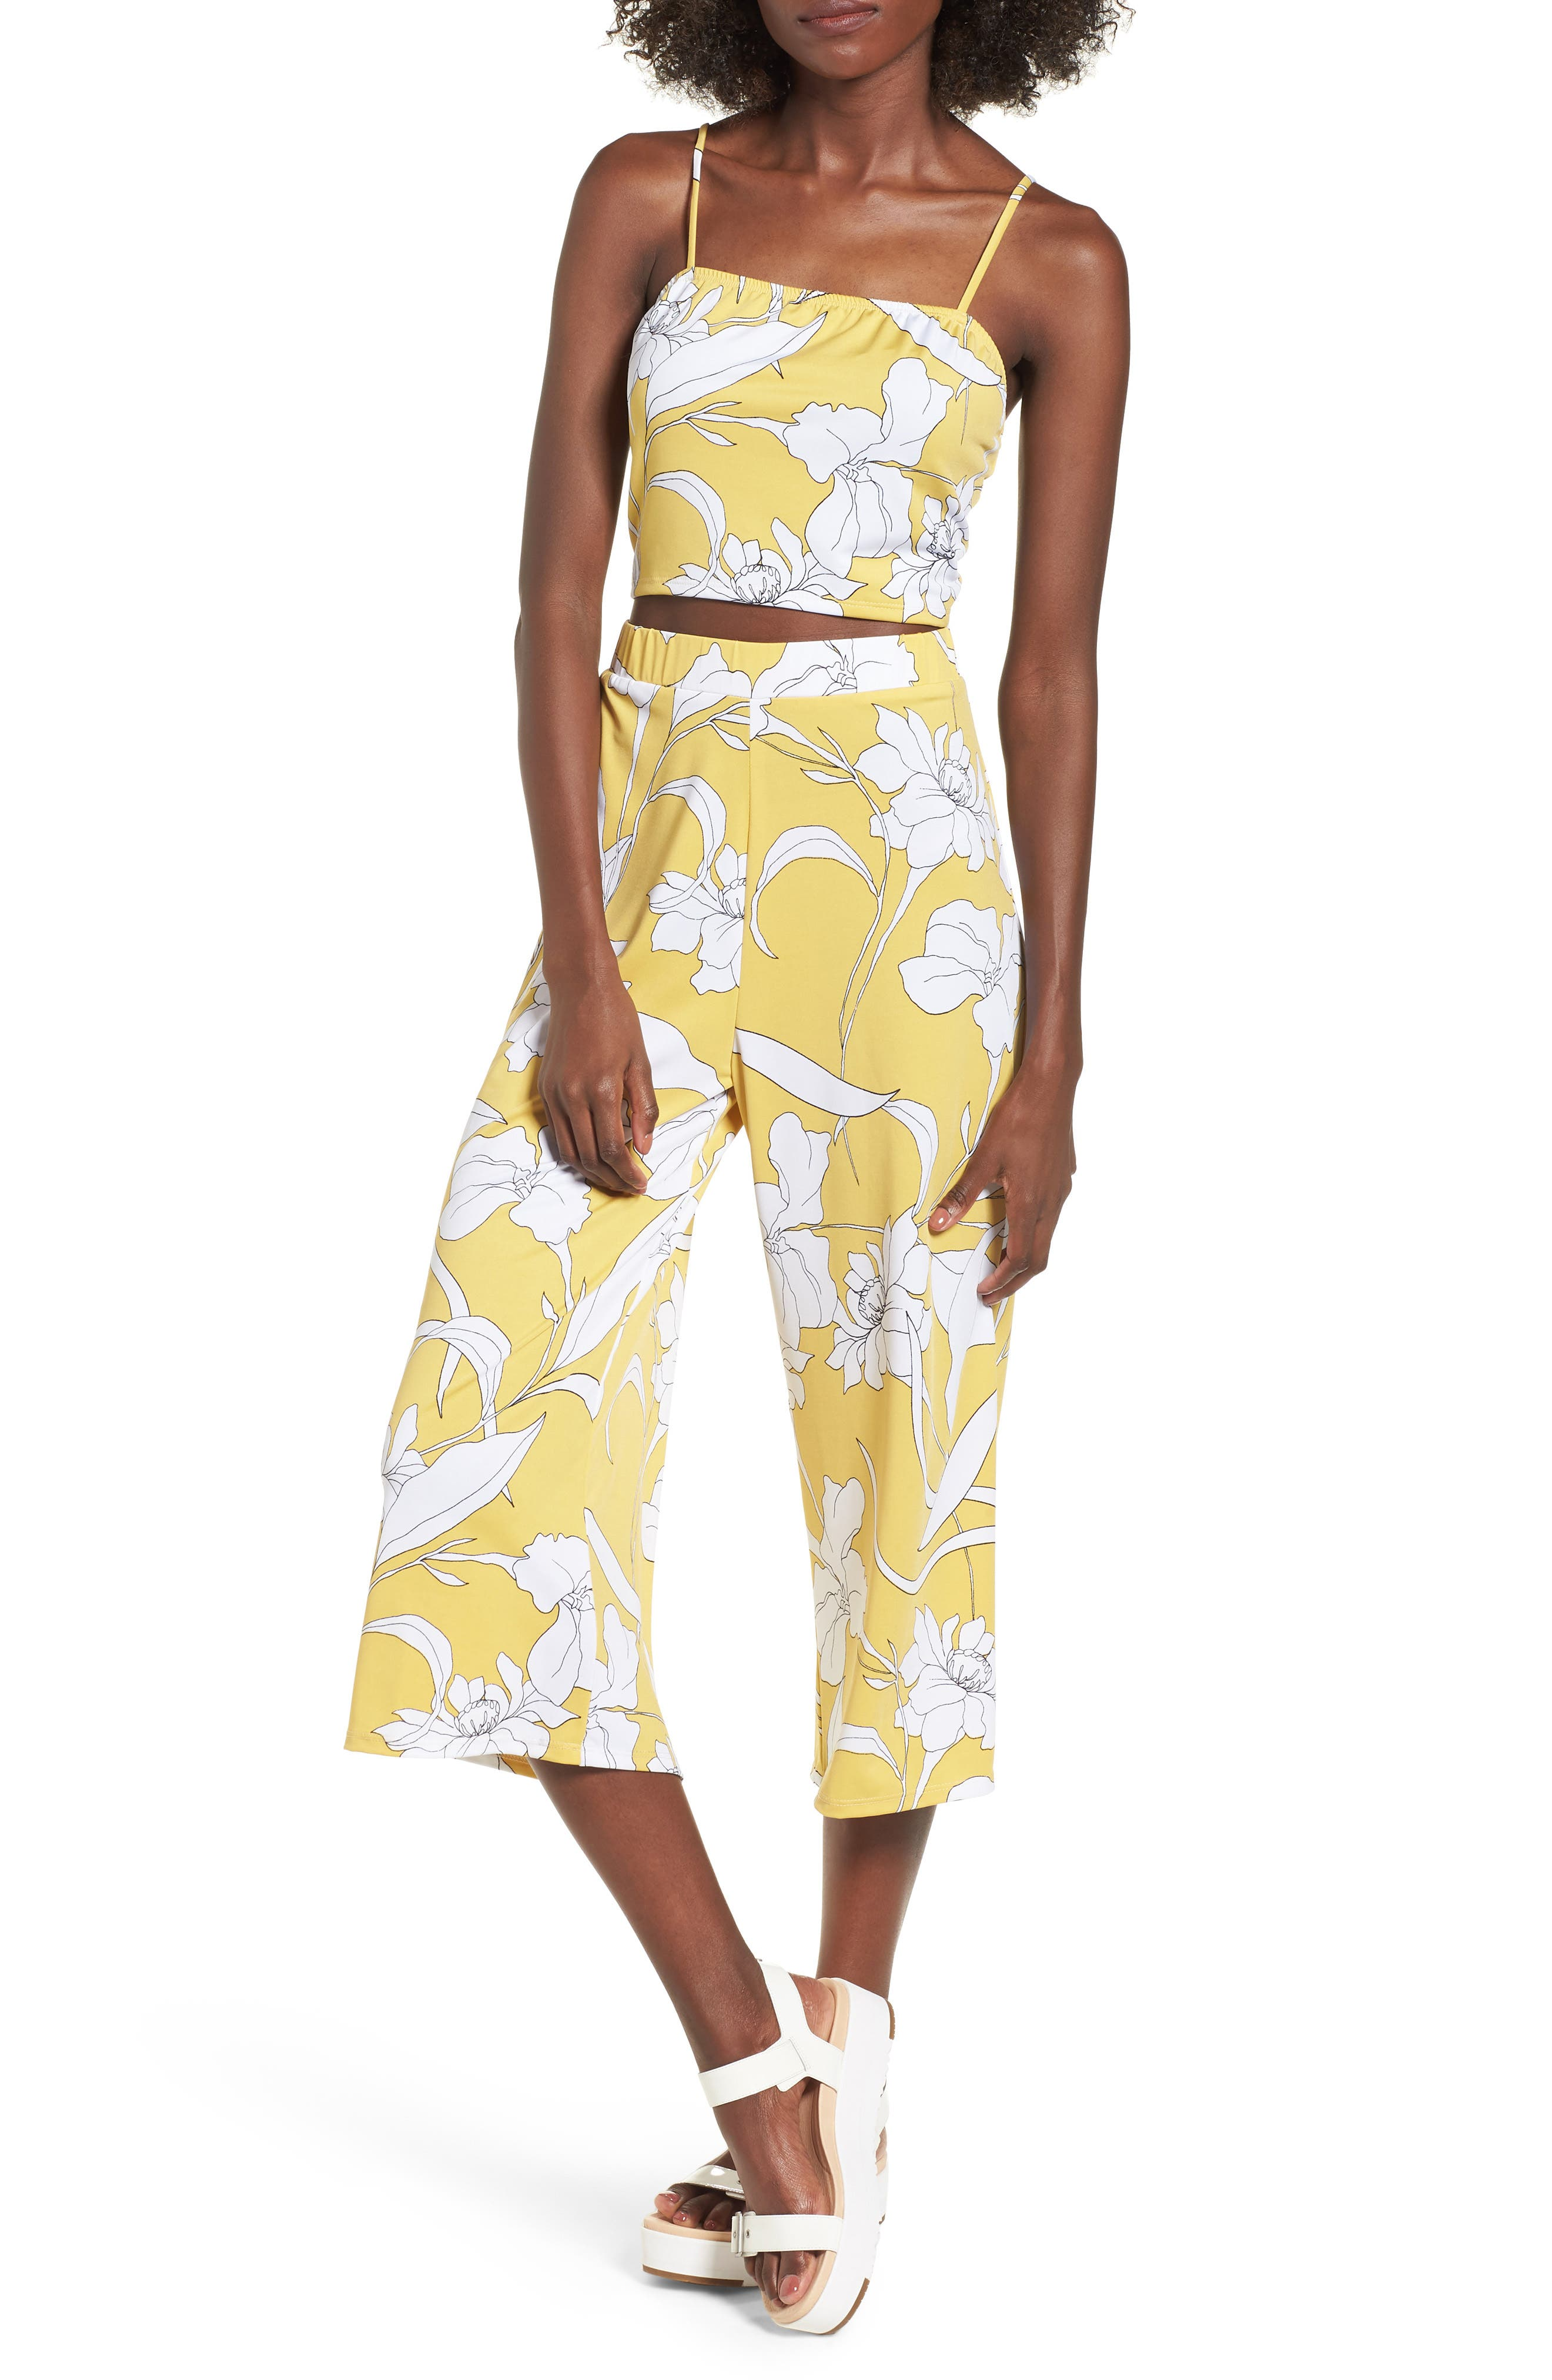 Floral Print Crop Top,                             Main thumbnail 1, color,                             Yellow Floral